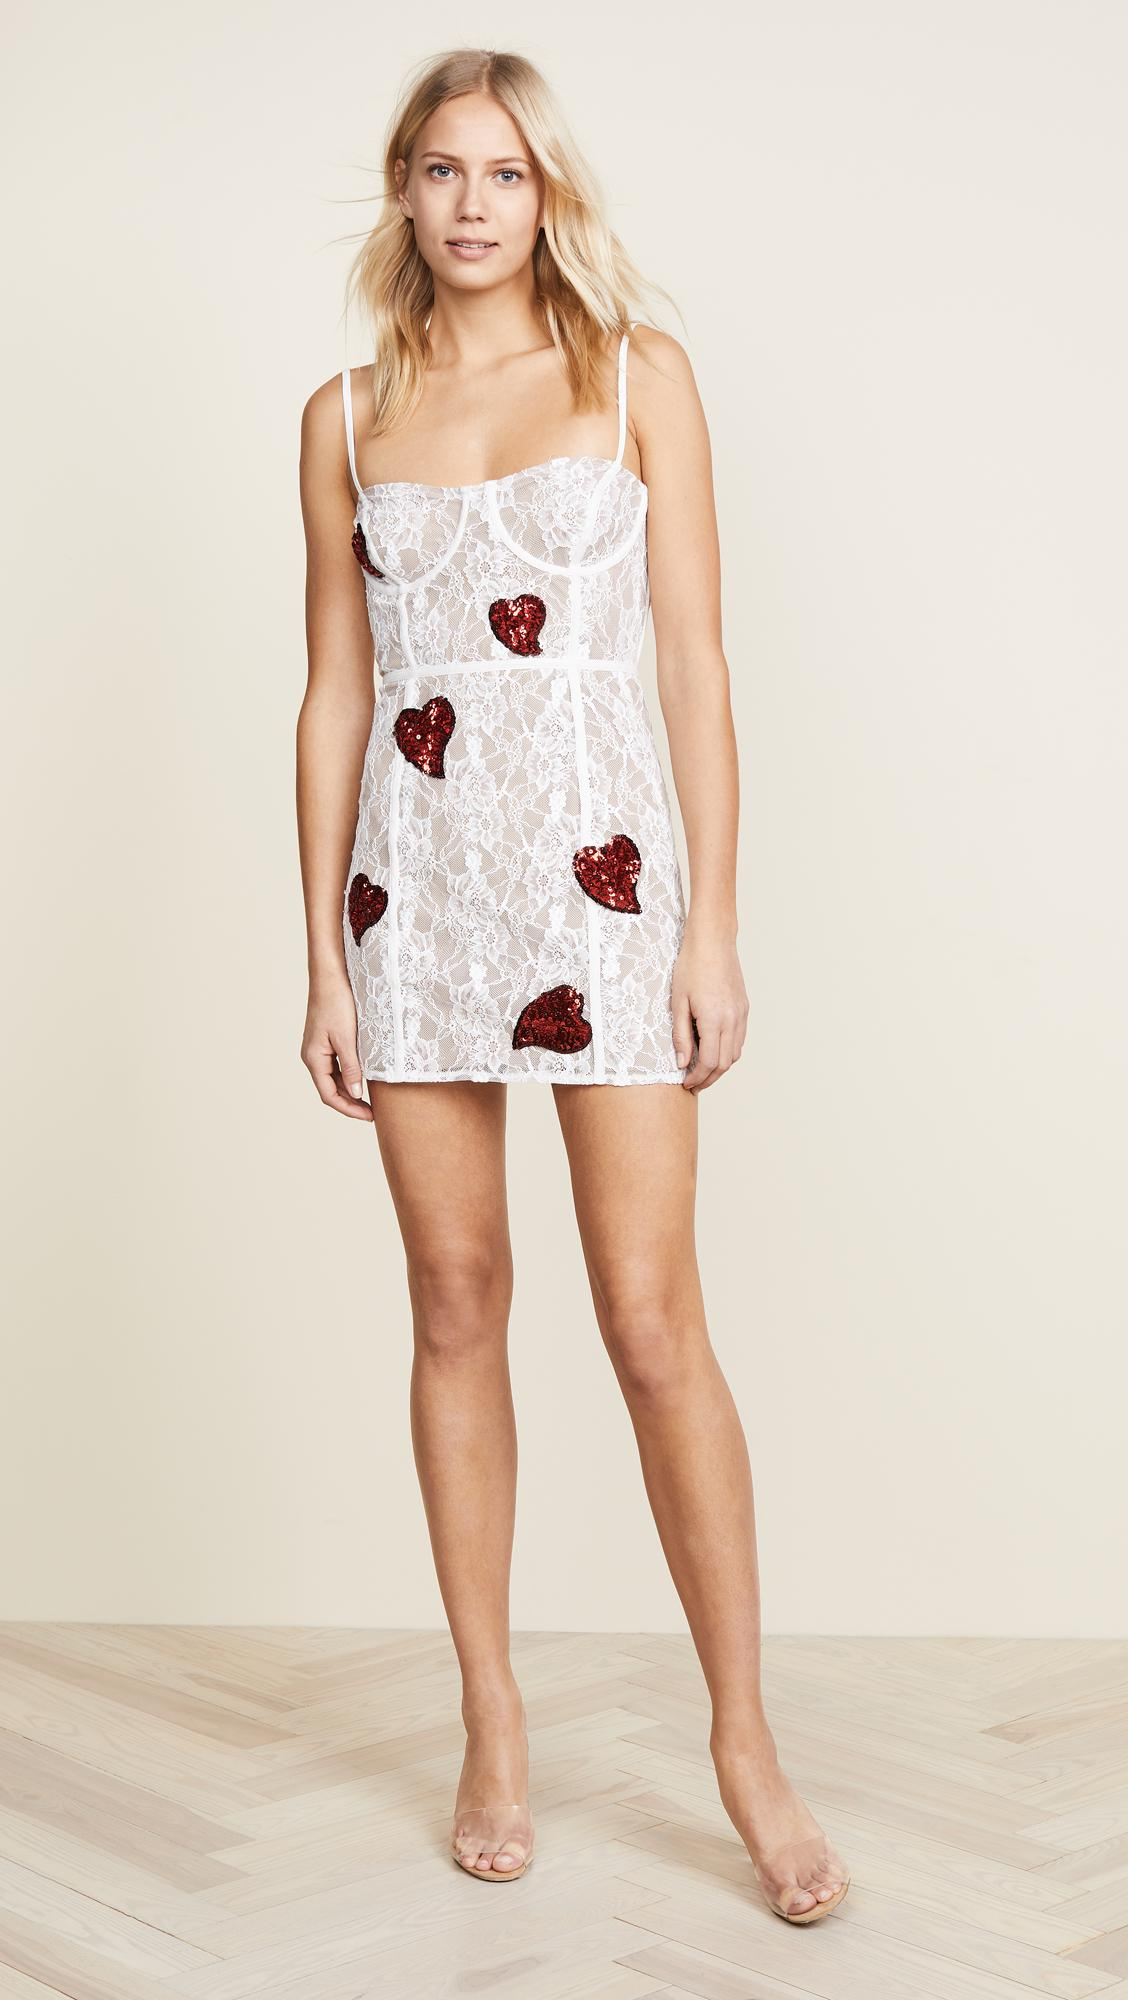 lyst for love lemons la christy mini dress in white. Black Bedroom Furniture Sets. Home Design Ideas